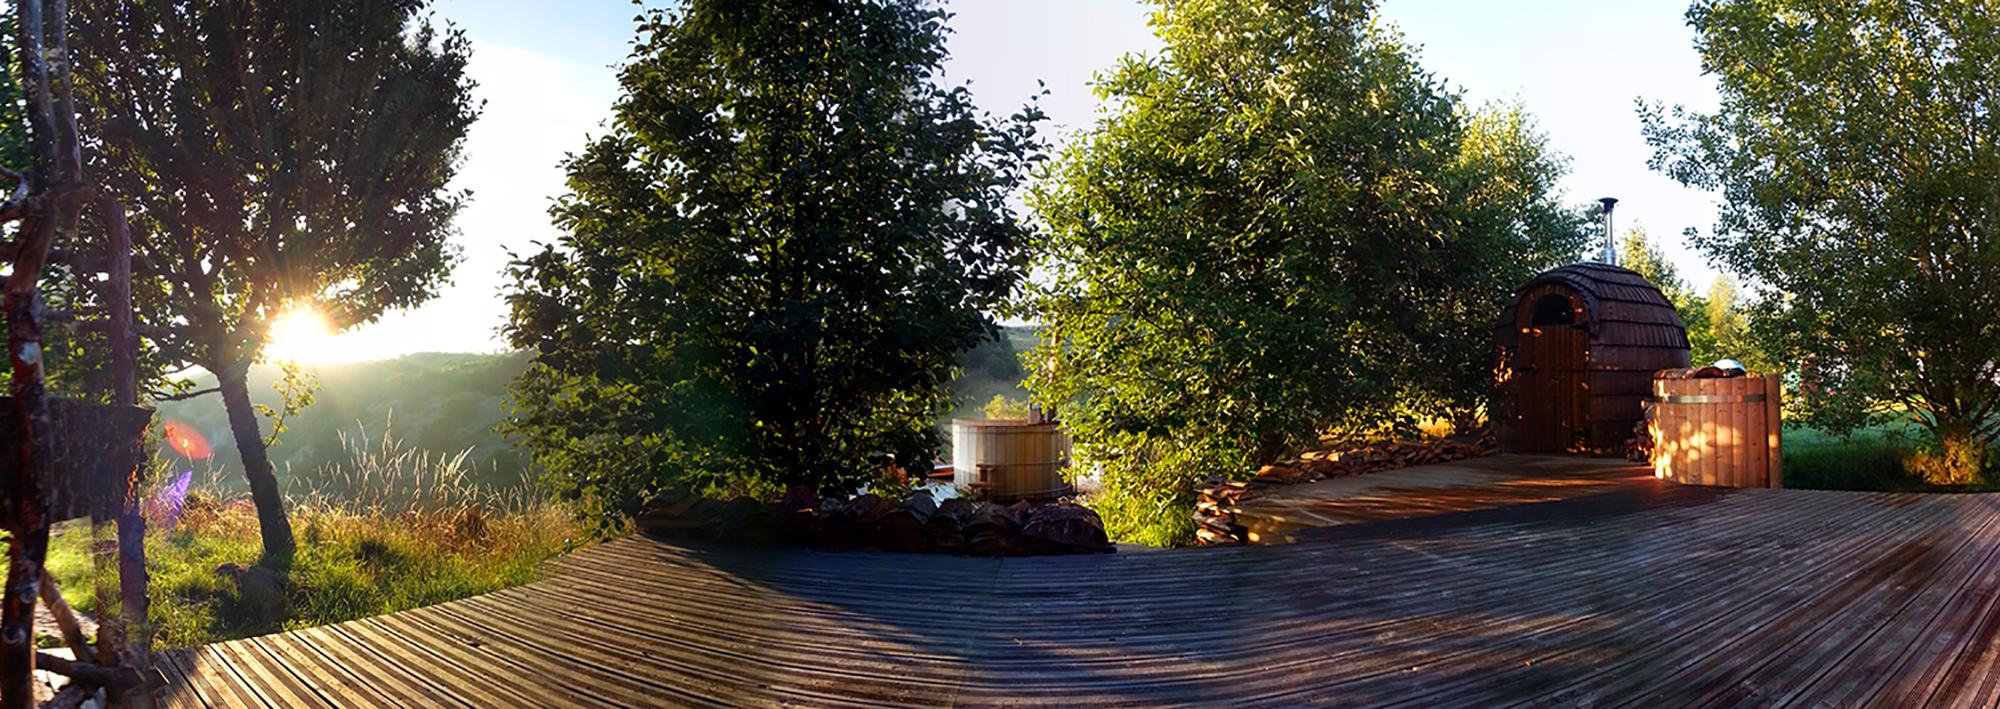 Bain finlandais + sauna bois + sauna infra-rouge